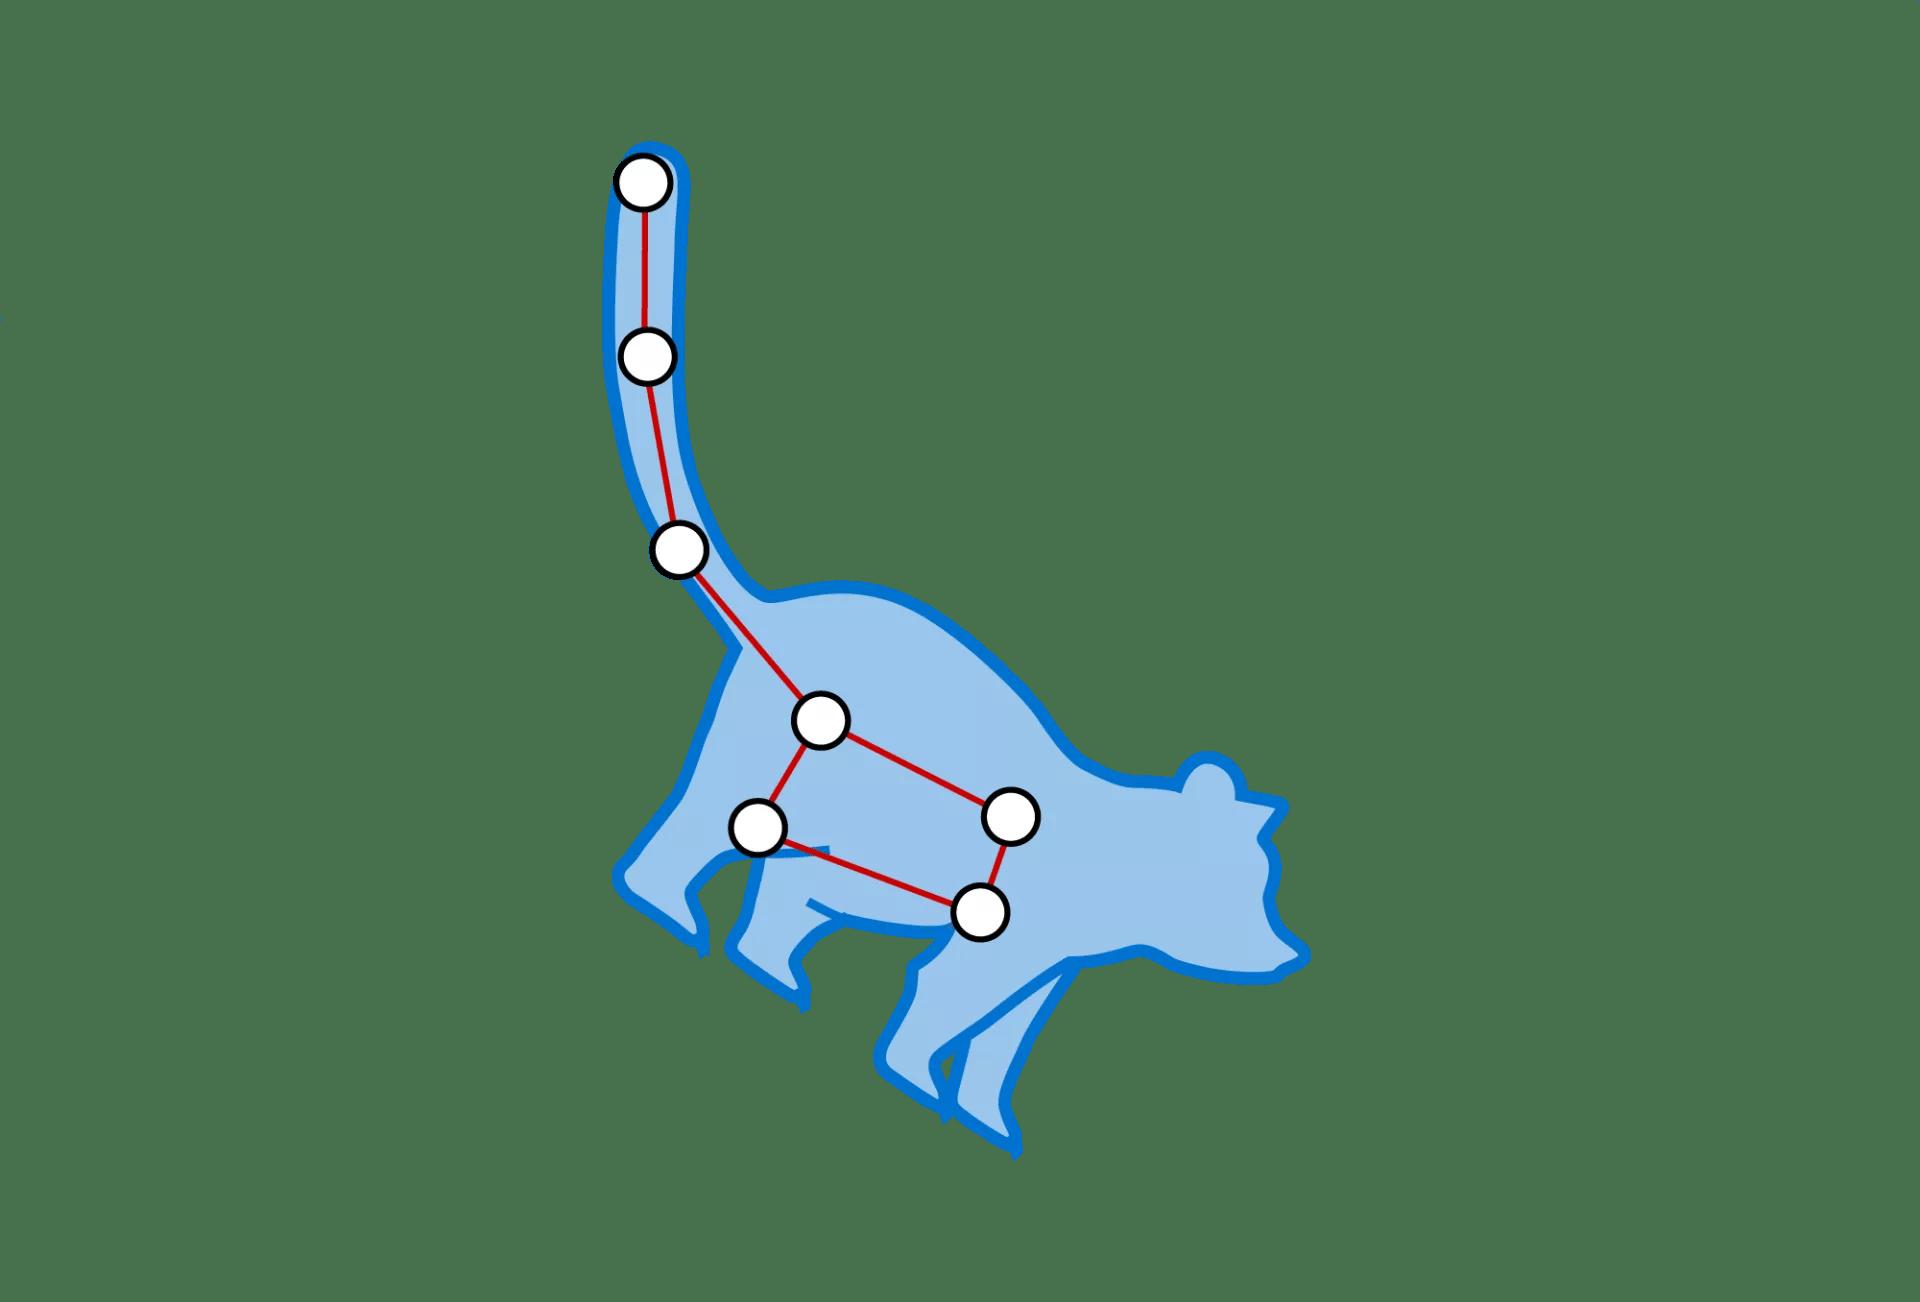 Ursa Minor Constellation Facts For Kids